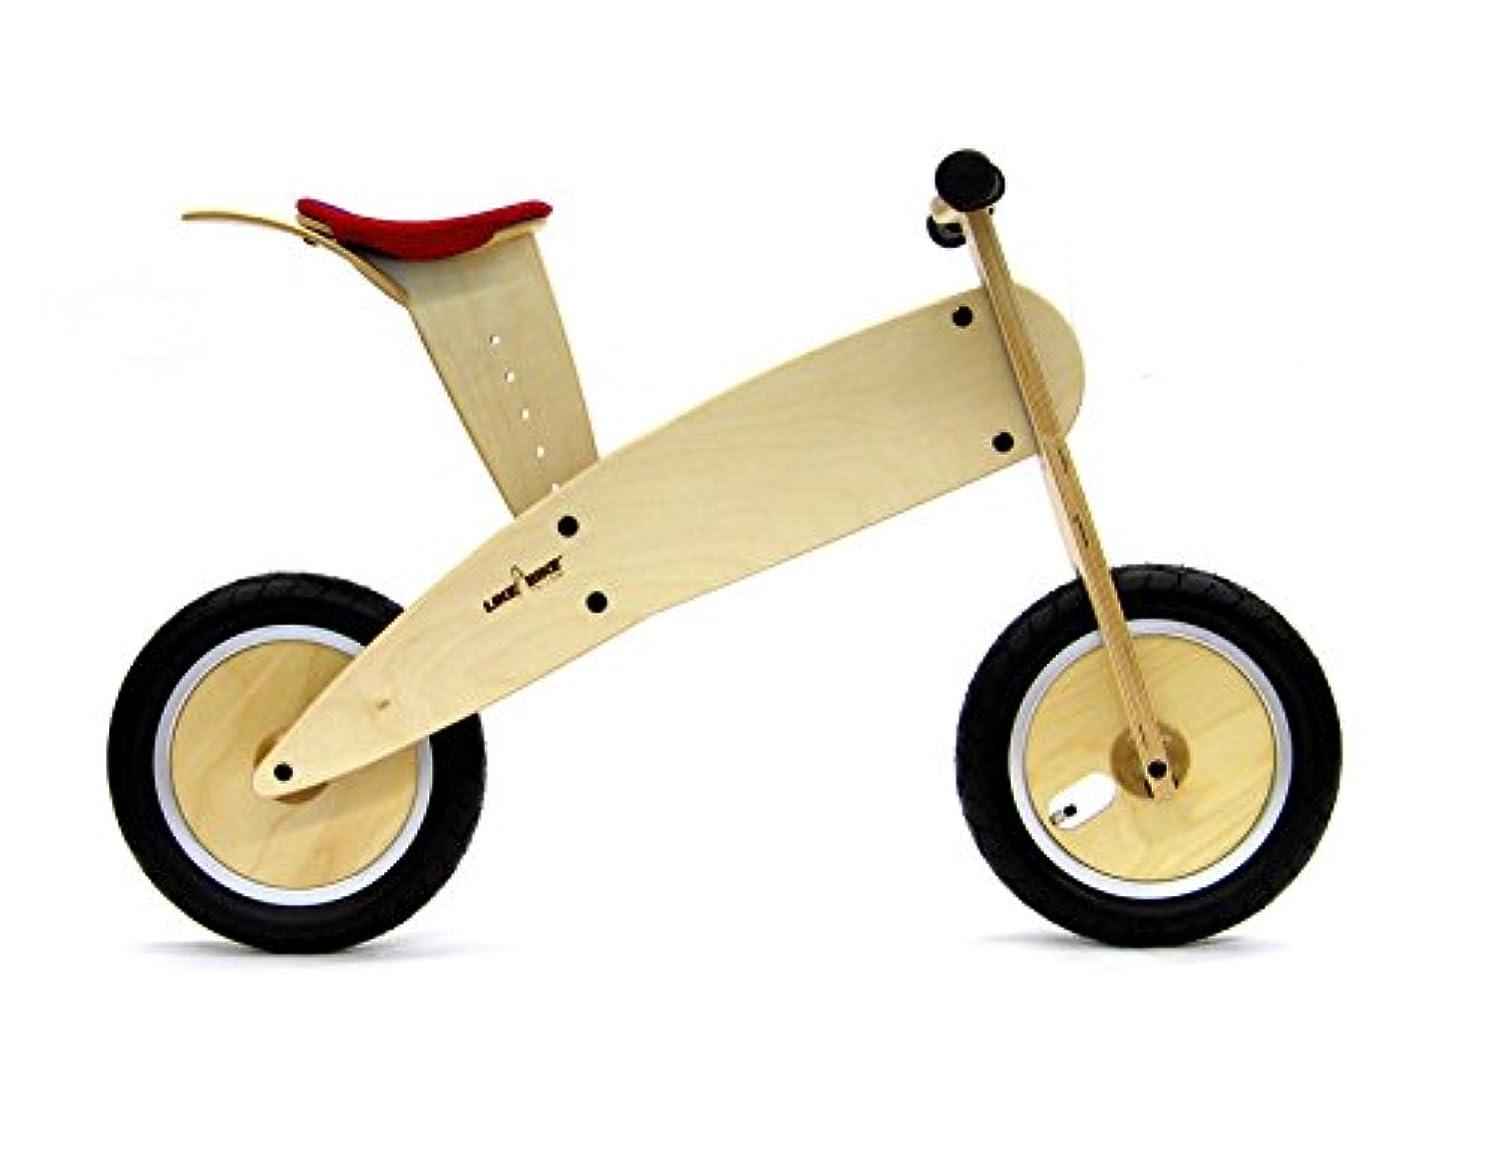 LIKEaBIKE Midi - Wooden Balance Bike